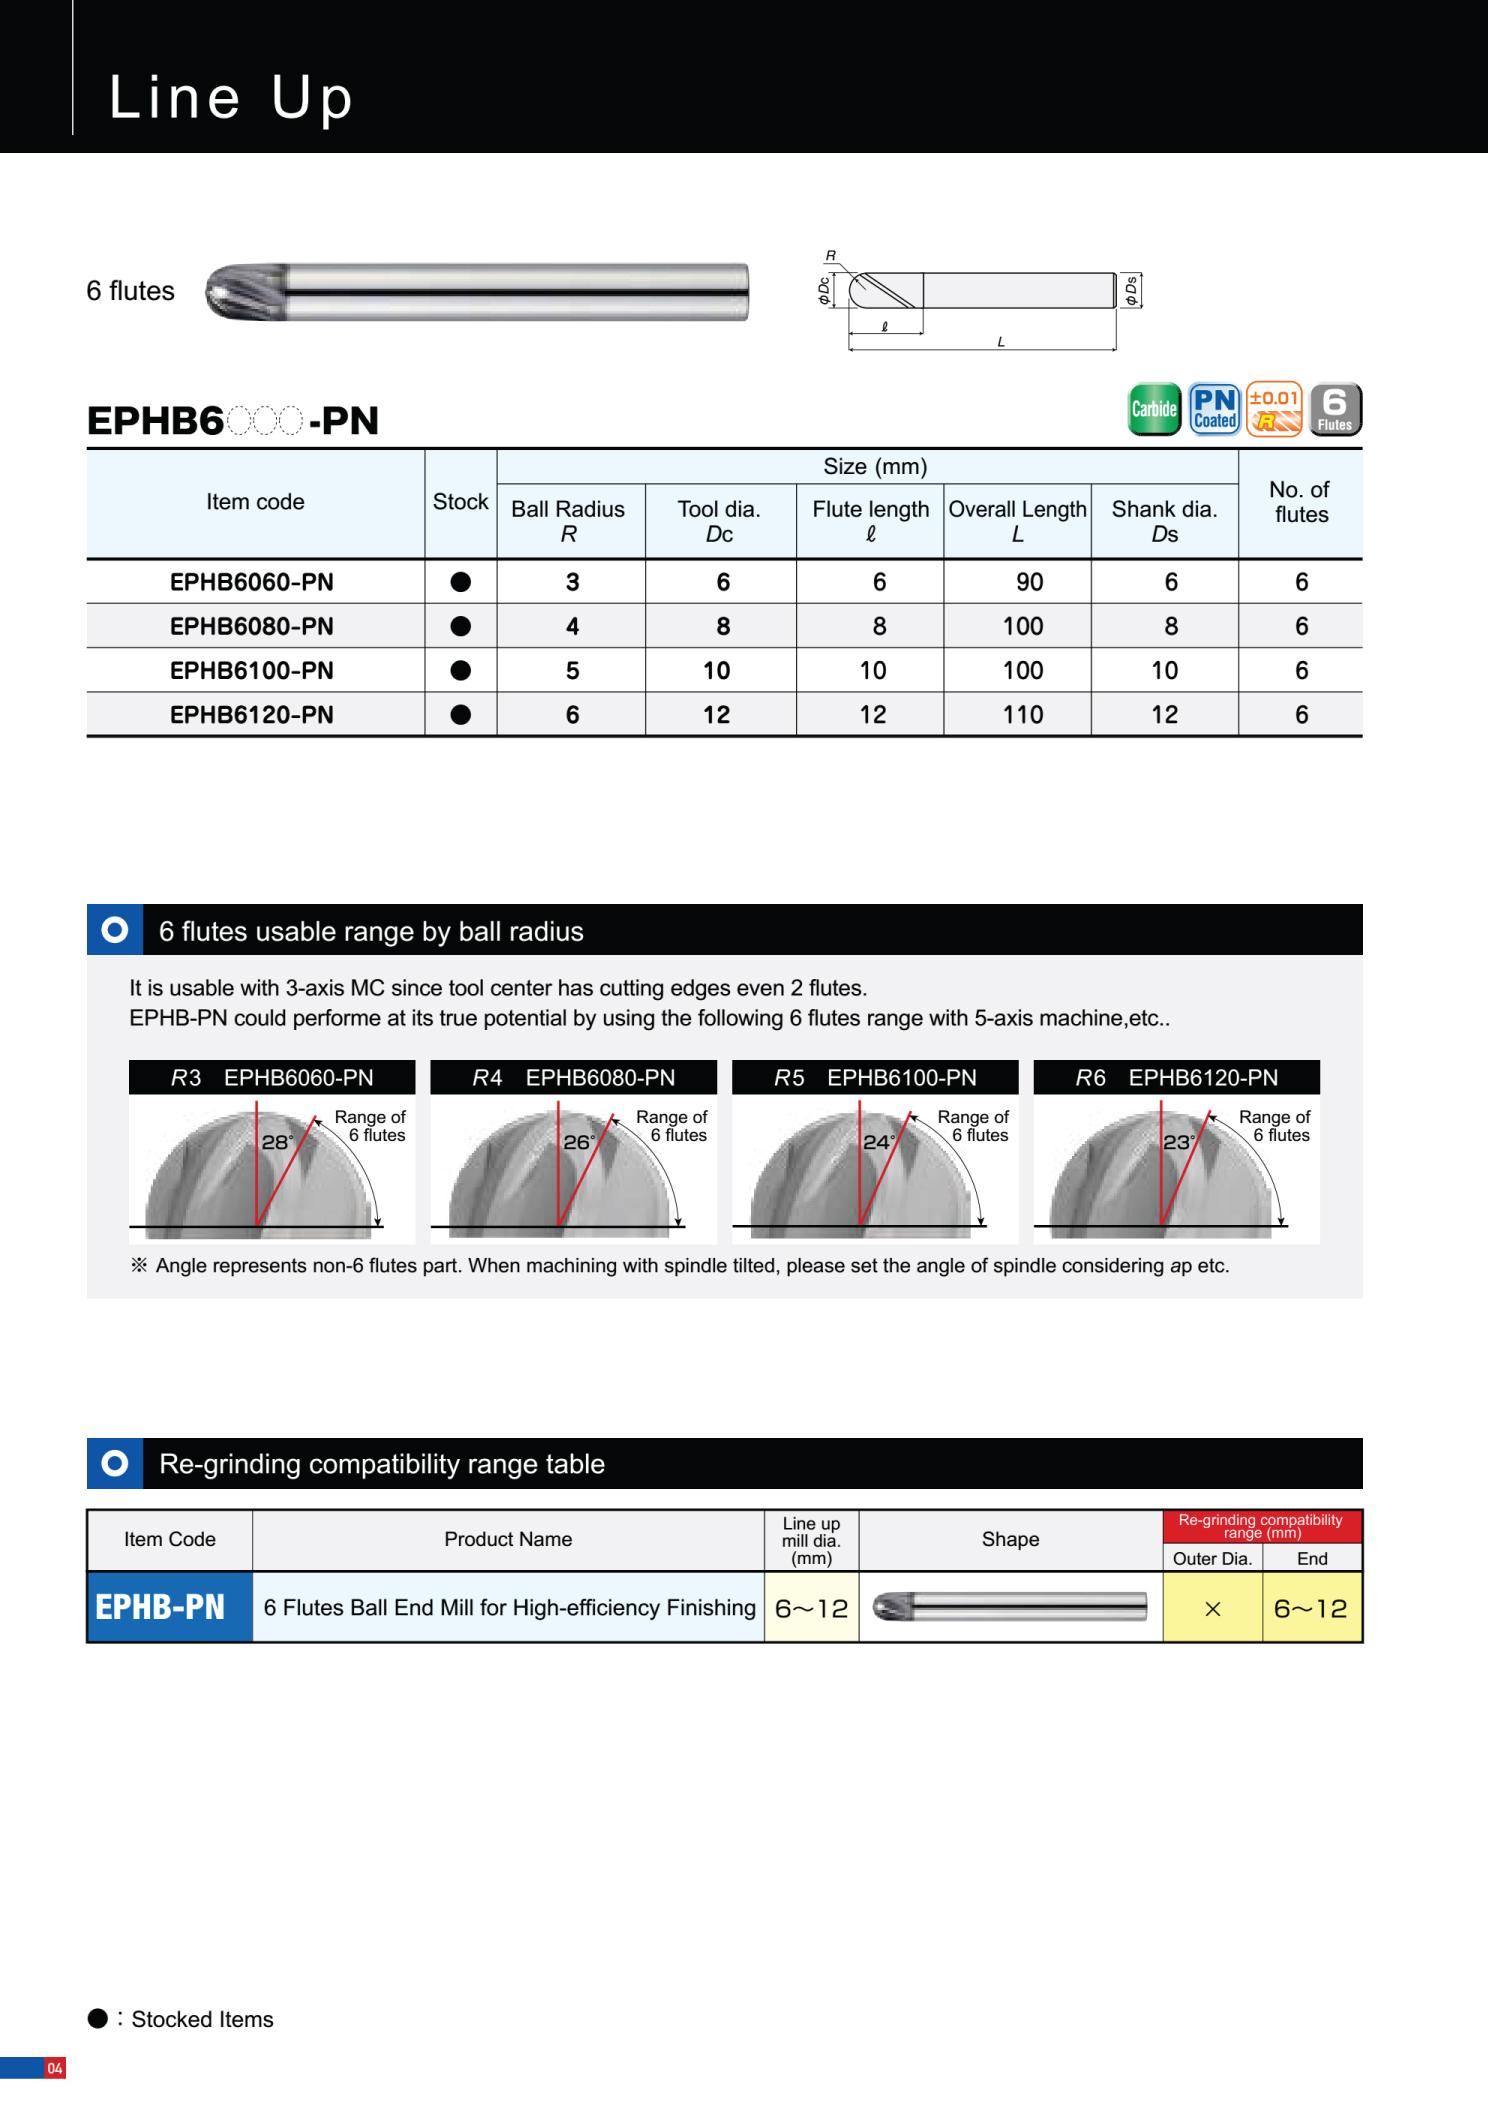 DAO PHAY CẦU HỢP KIM MOLDINO EPHB6-PN HIGH EFFICIENCY 2